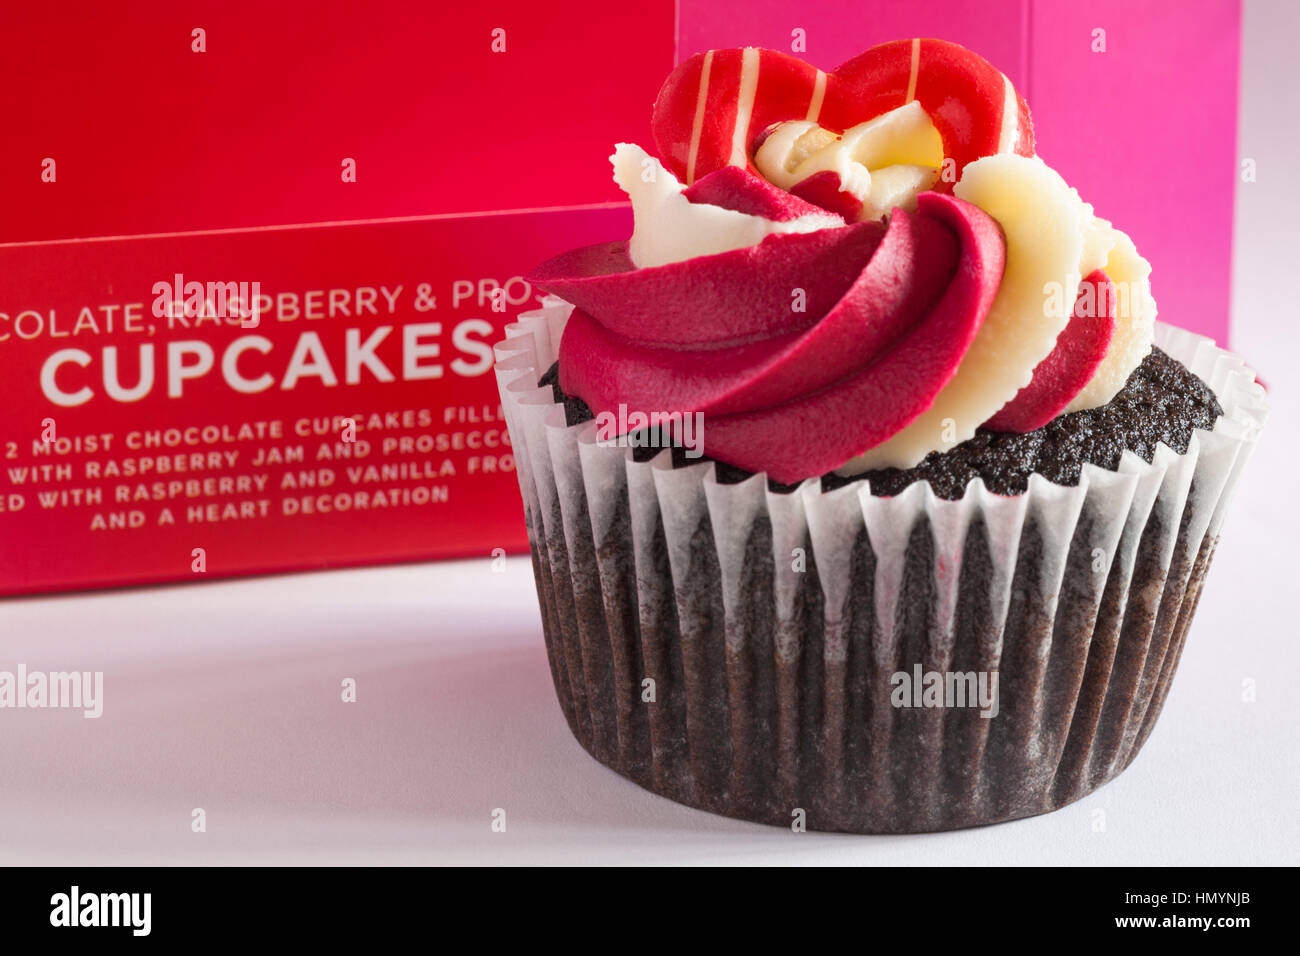 M S Schokolade Himbeere Prosecco Cupcakes Ideal Fur Valentinstag